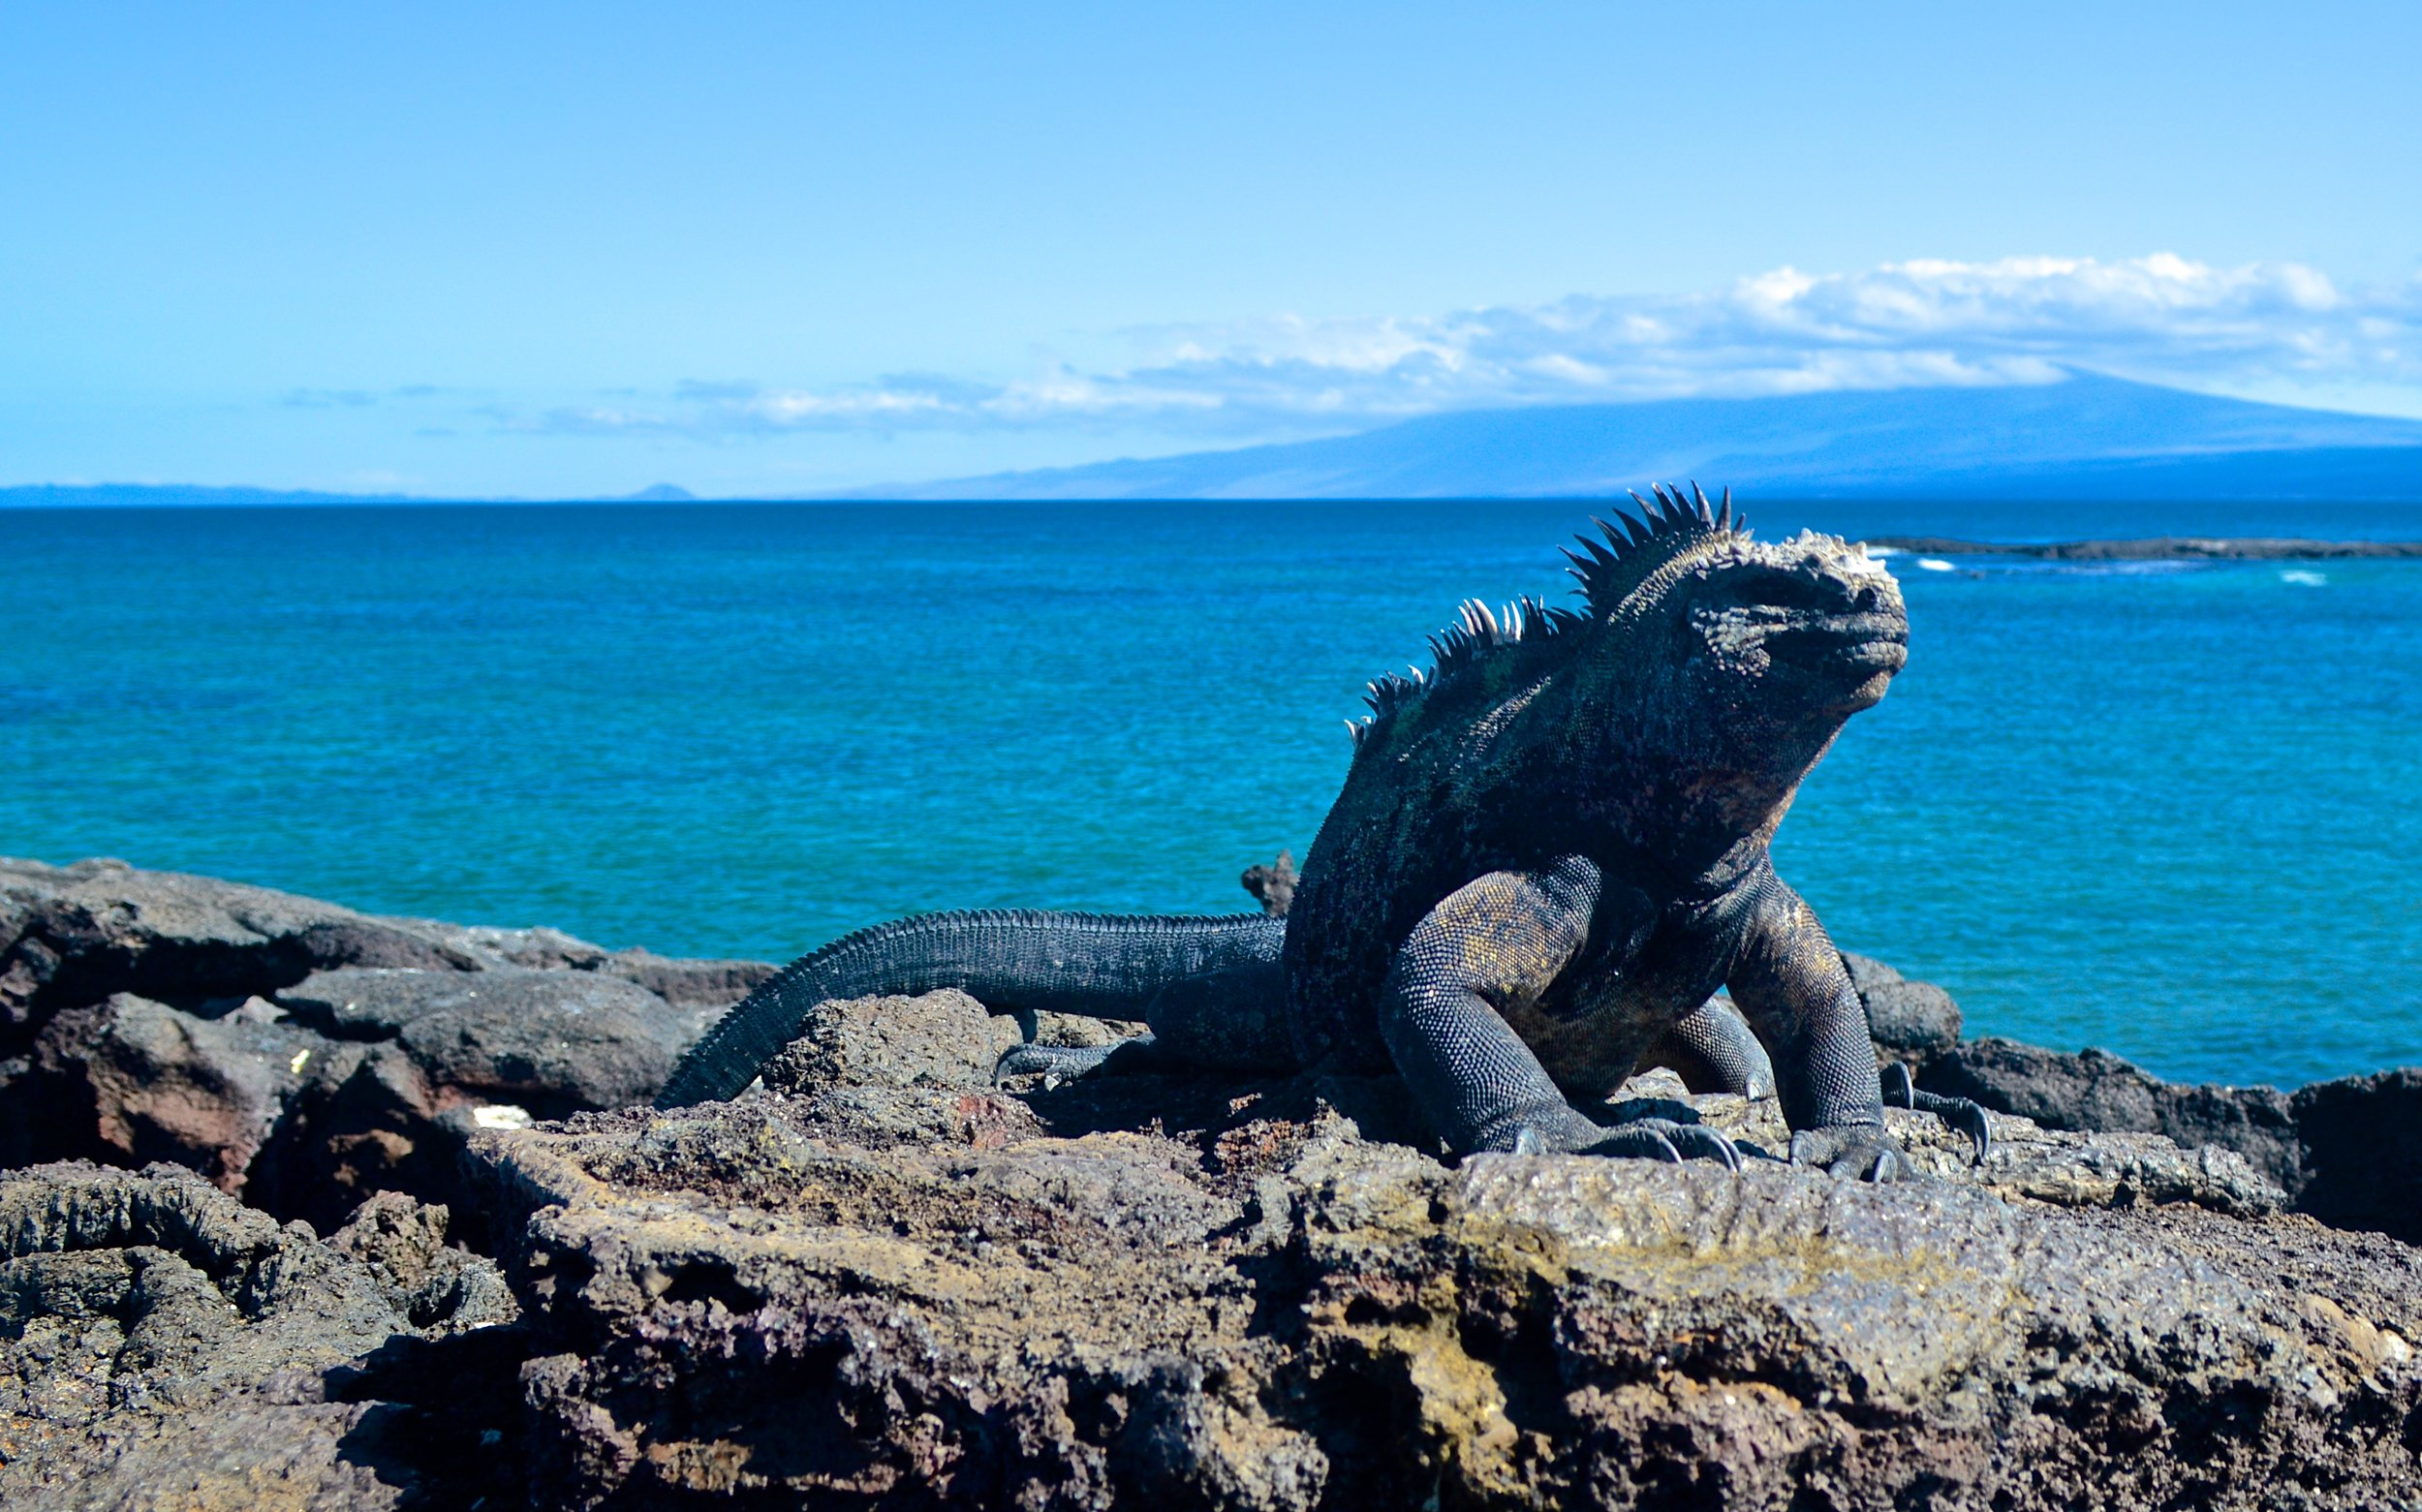 Galapagos_Photo_4_1.jpg